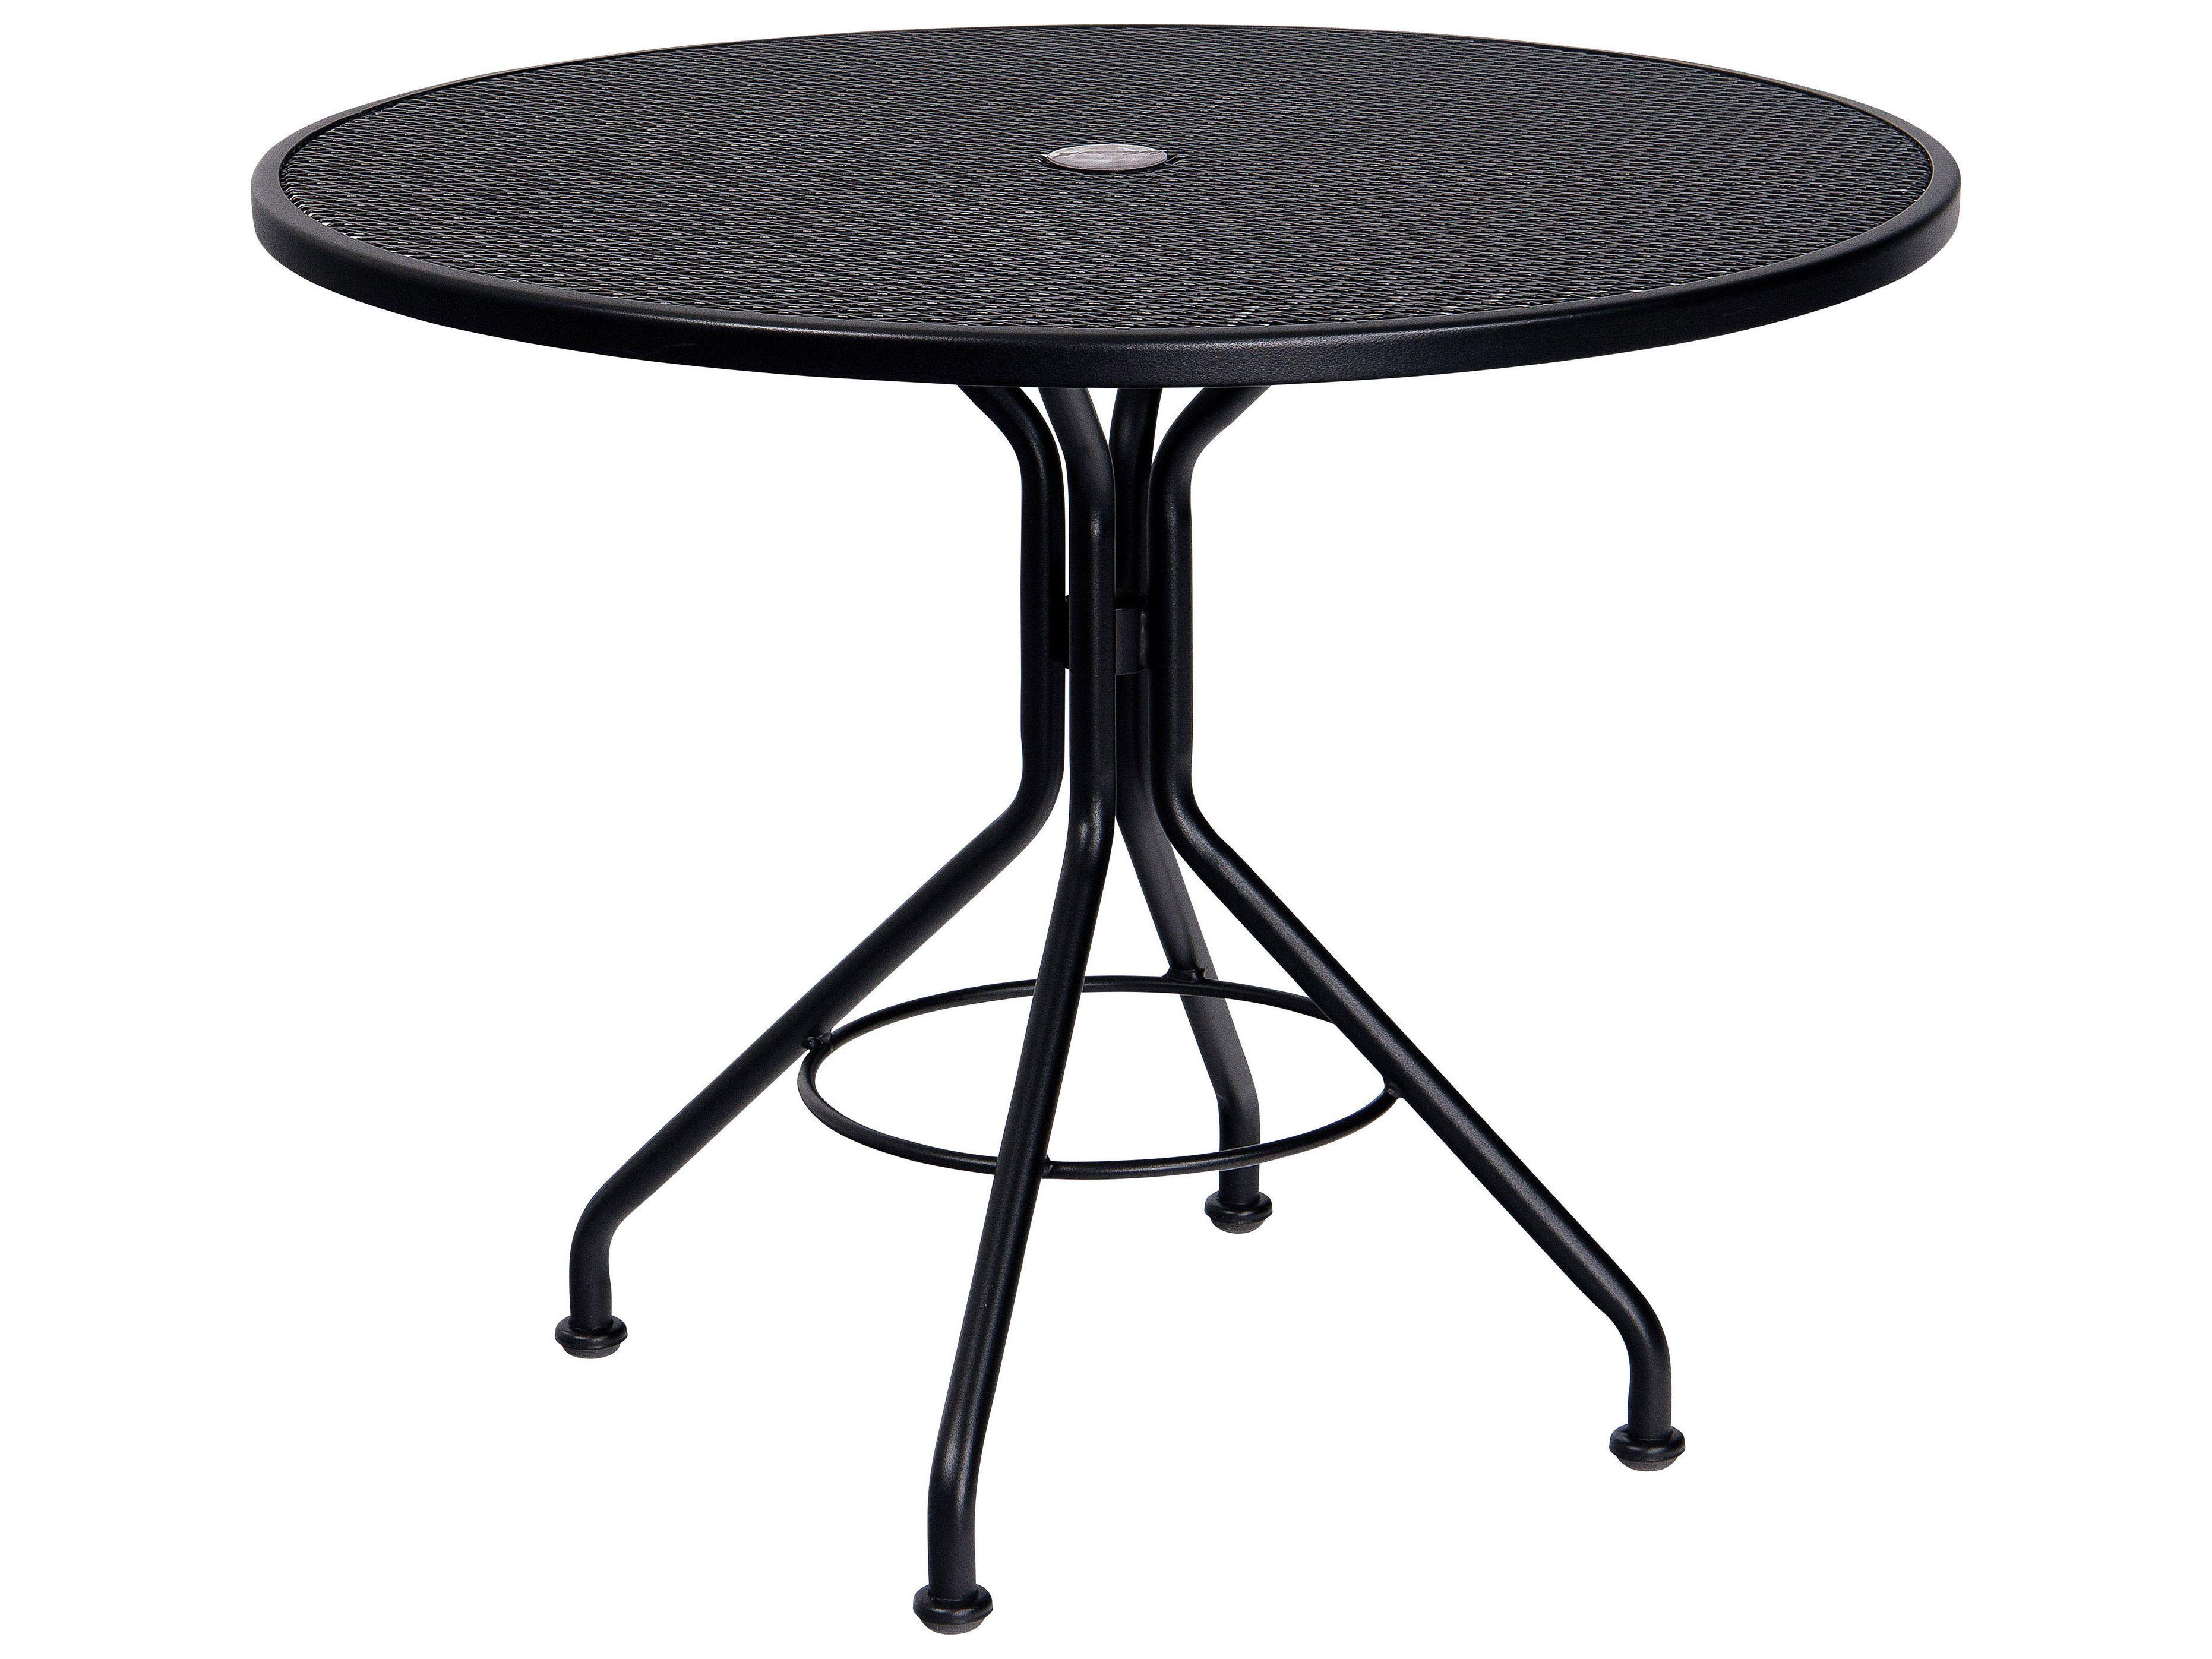 Woodard Mesh Wrought Iron 36 Round Bistro Umbrella Table 280135 Artes Em Ferro Ferro [ jpg ]